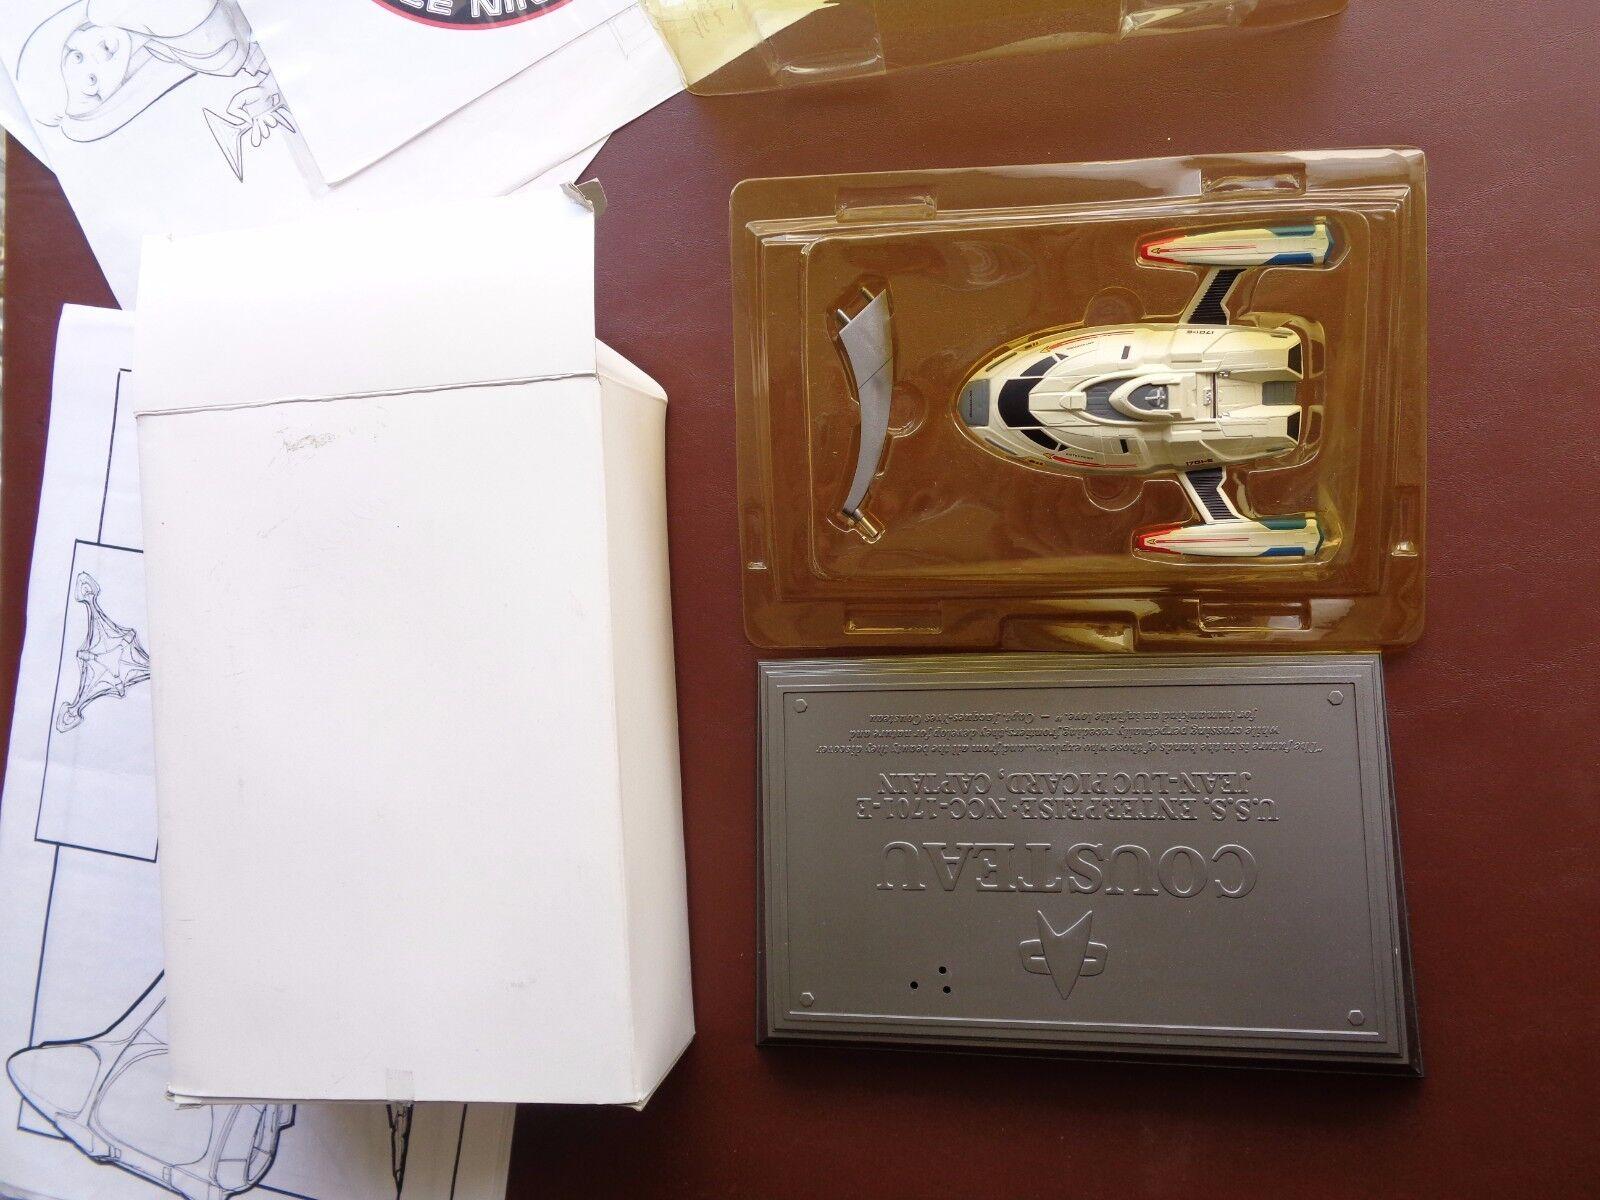 Star Trek Starfleet Captain's Yacht USS Cousteau from Insurrection Movie